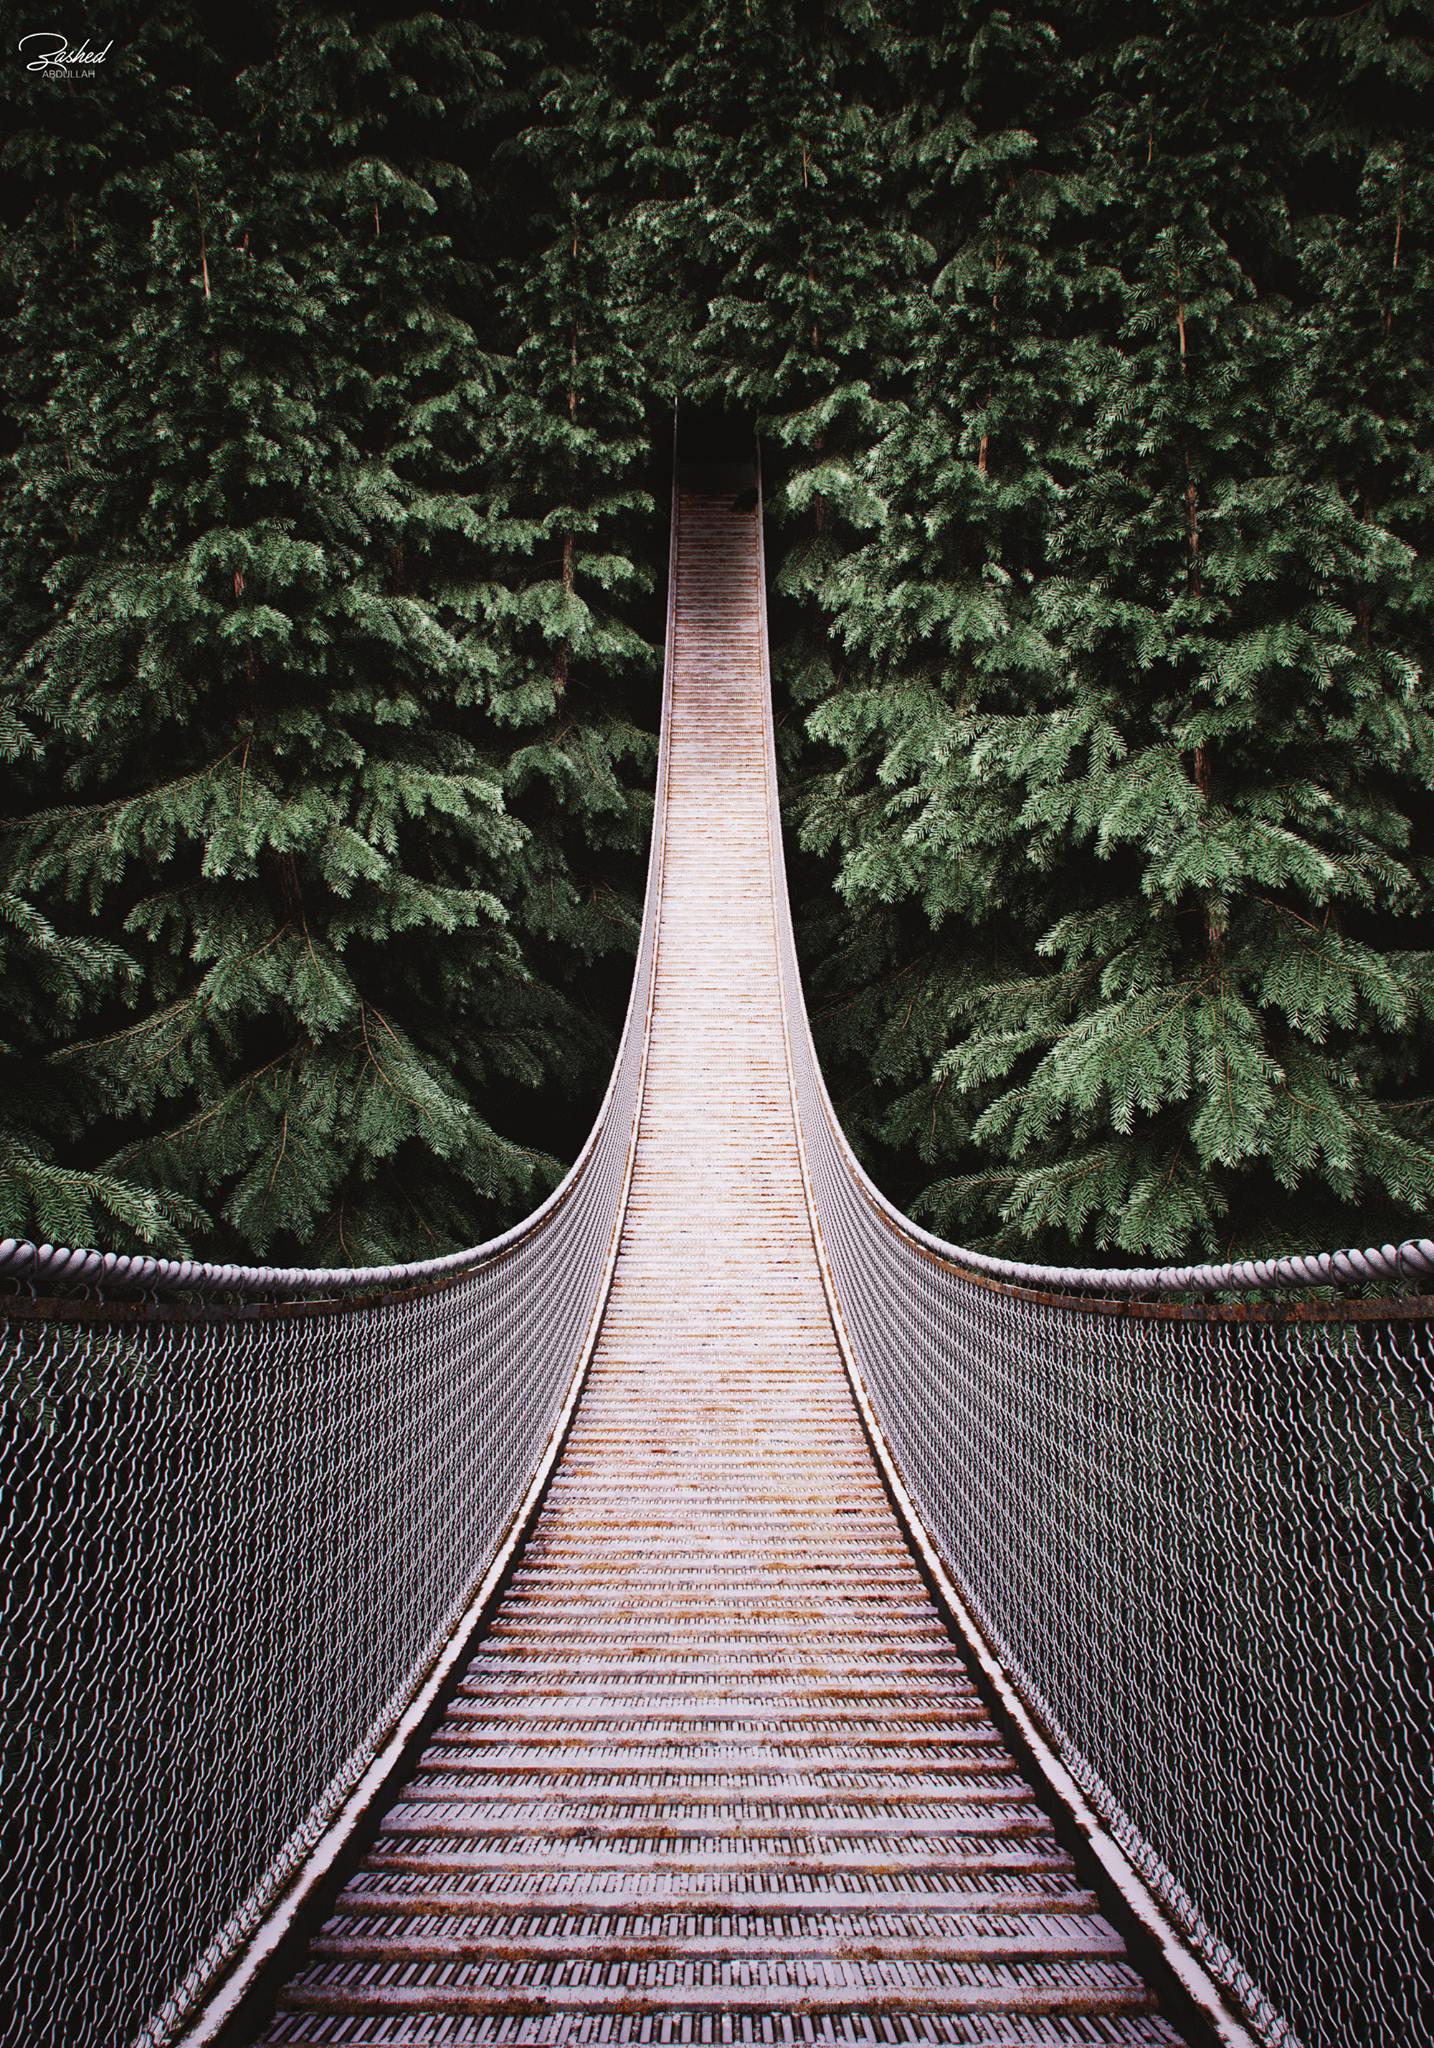 VWArtclub - Capilano Bridge